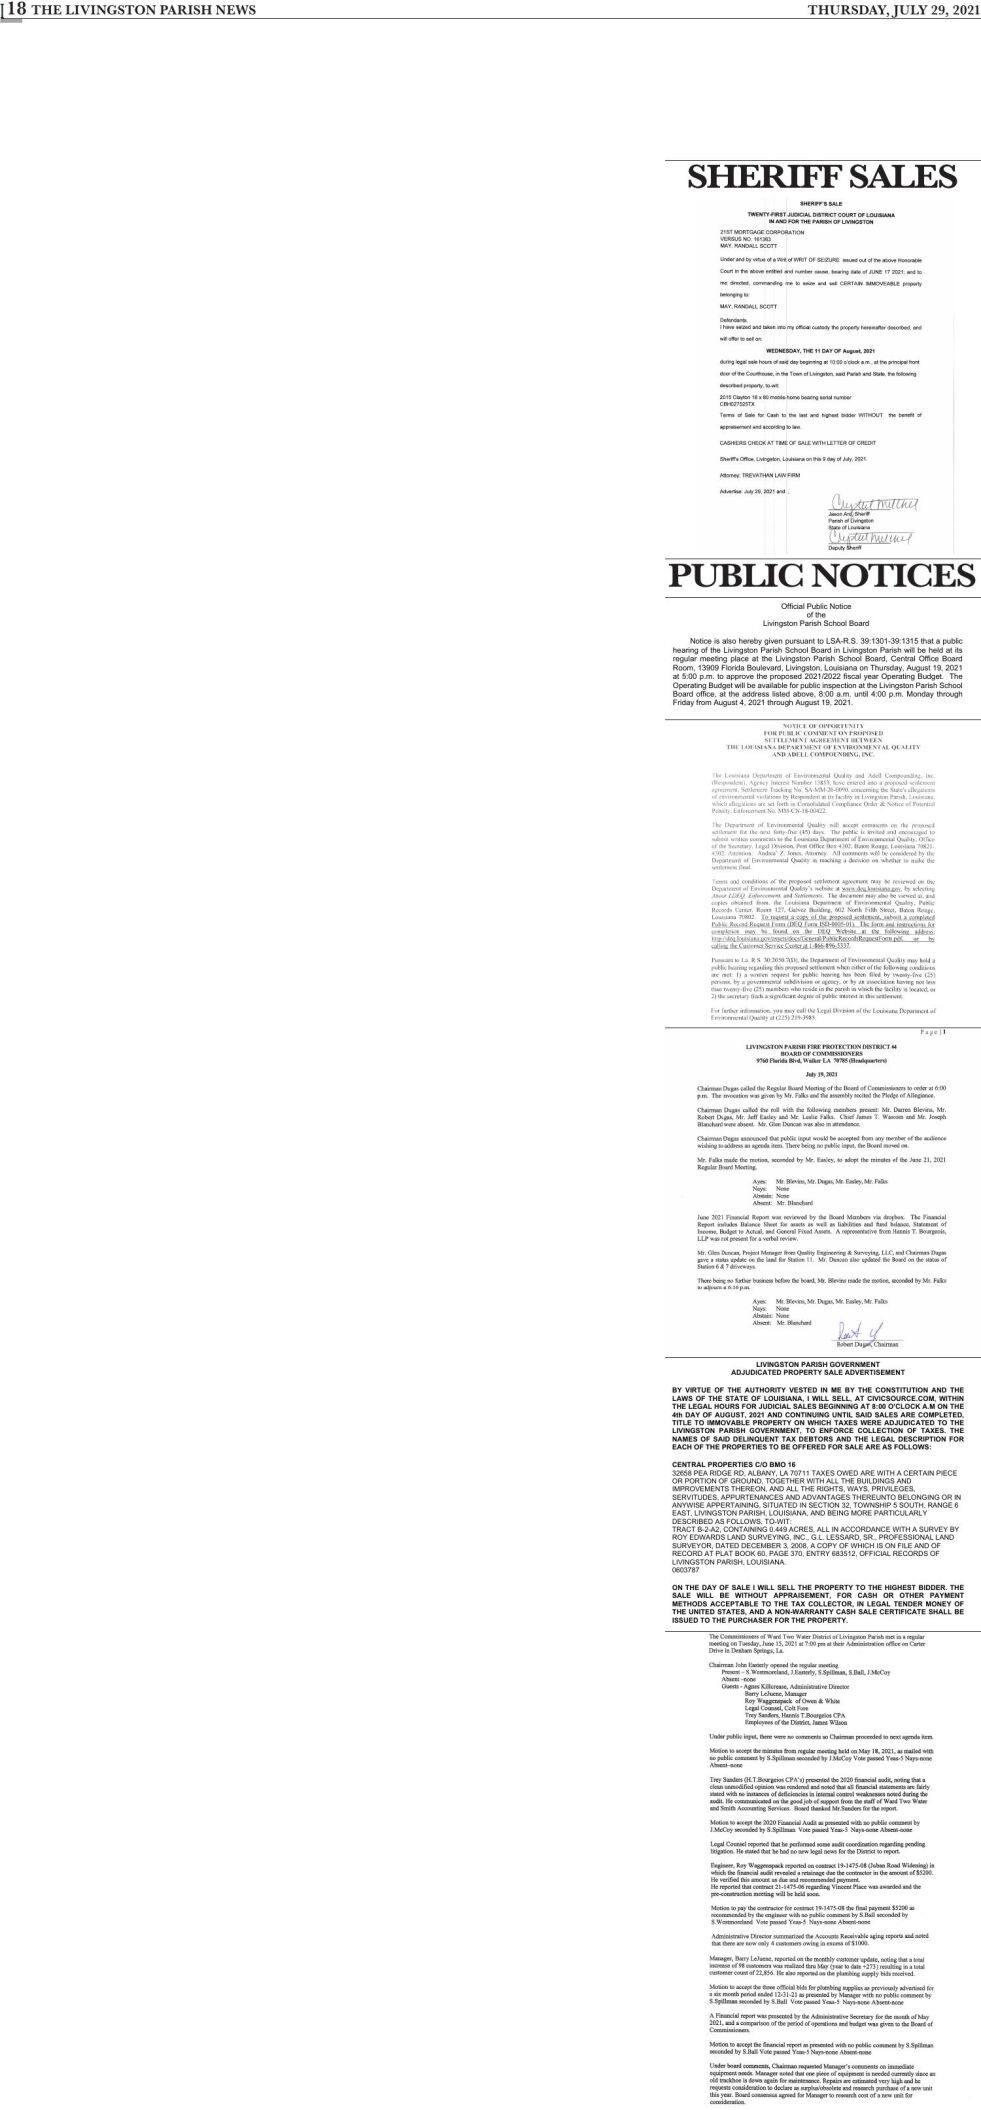 Public Notices published July 29, 2021